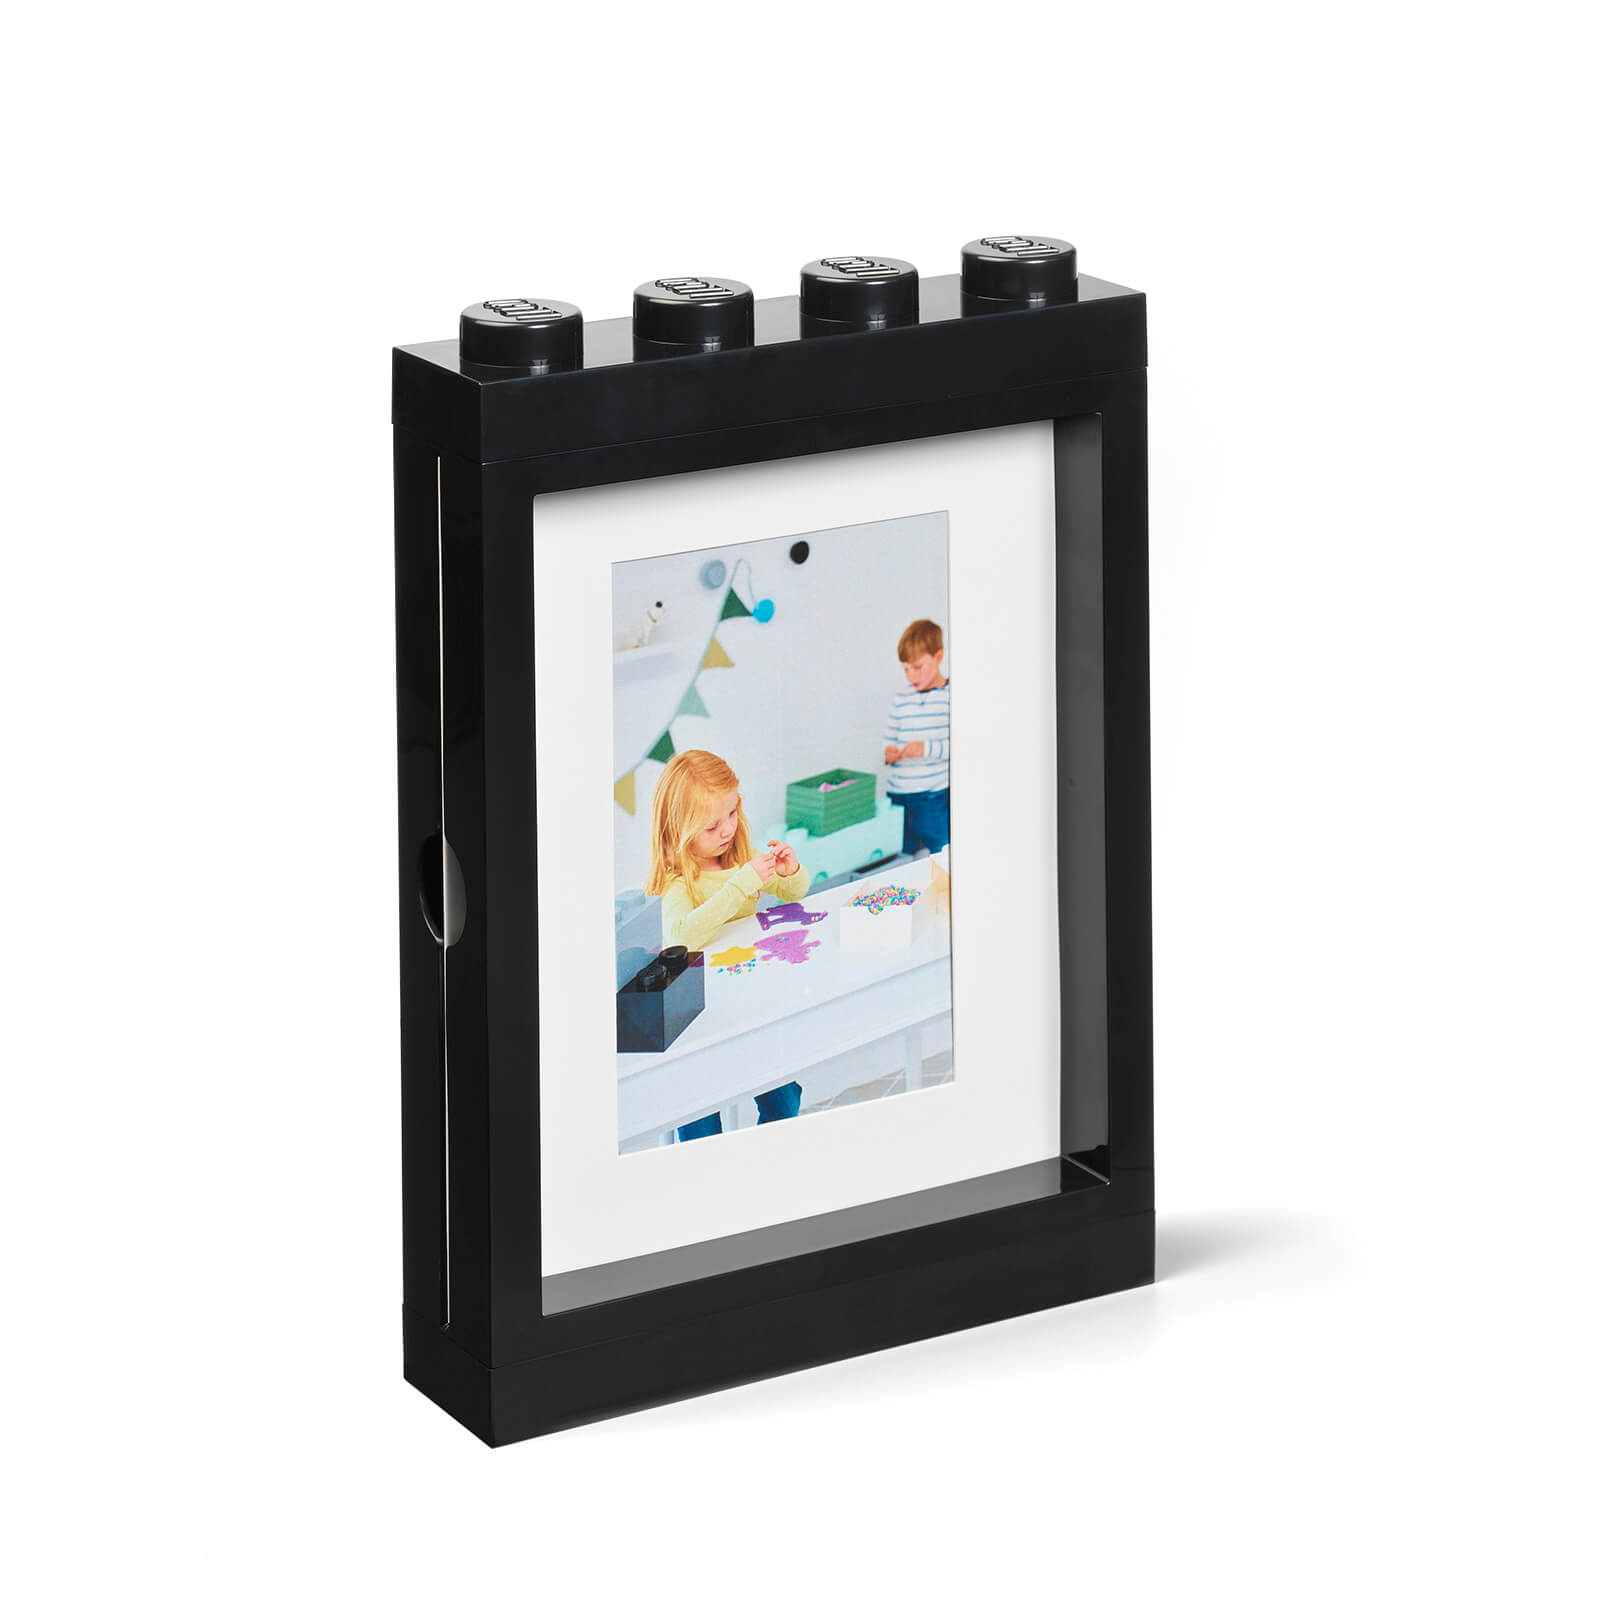 Image of LEGO Picture Frame - Black